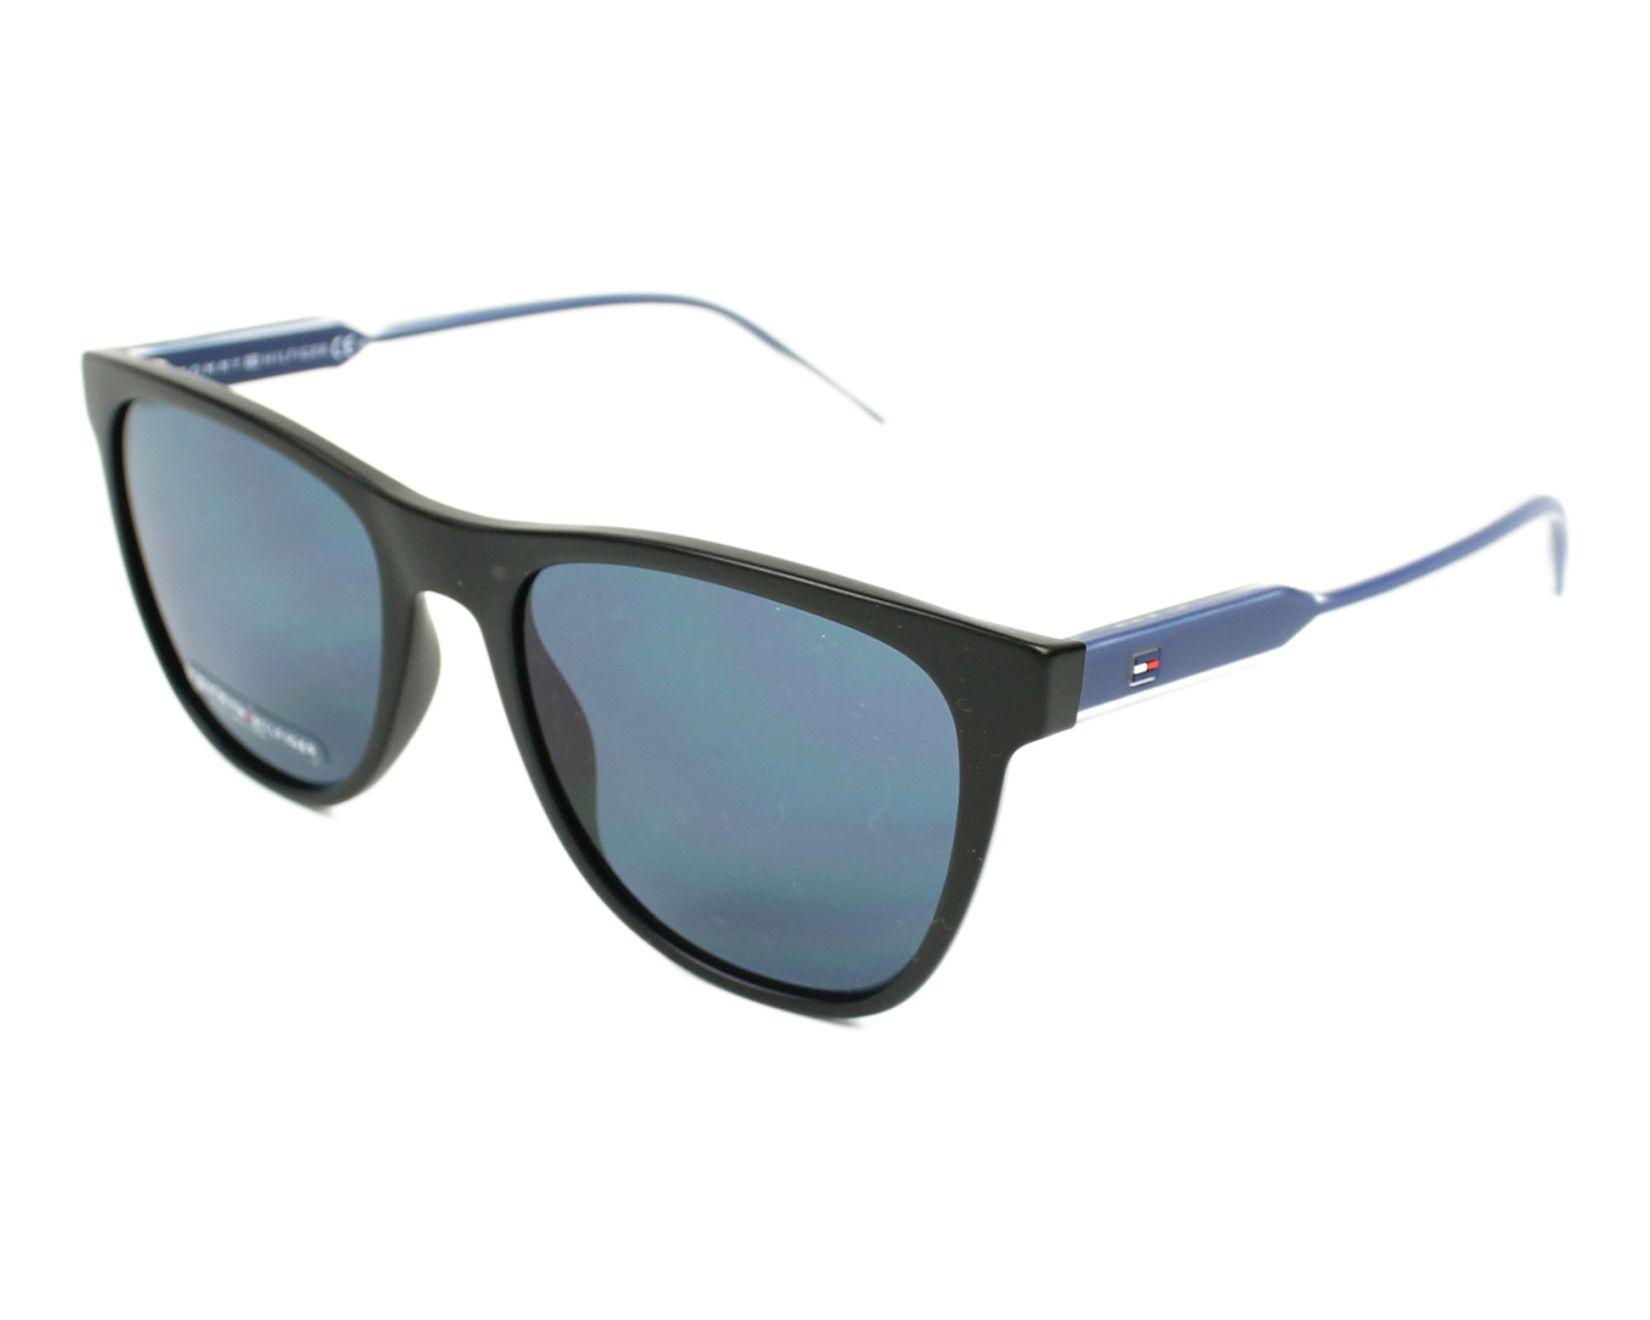 achat lunettes de soleil tommy hilfiger th 1440 s d4p 9a visionet. Black Bedroom Furniture Sets. Home Design Ideas